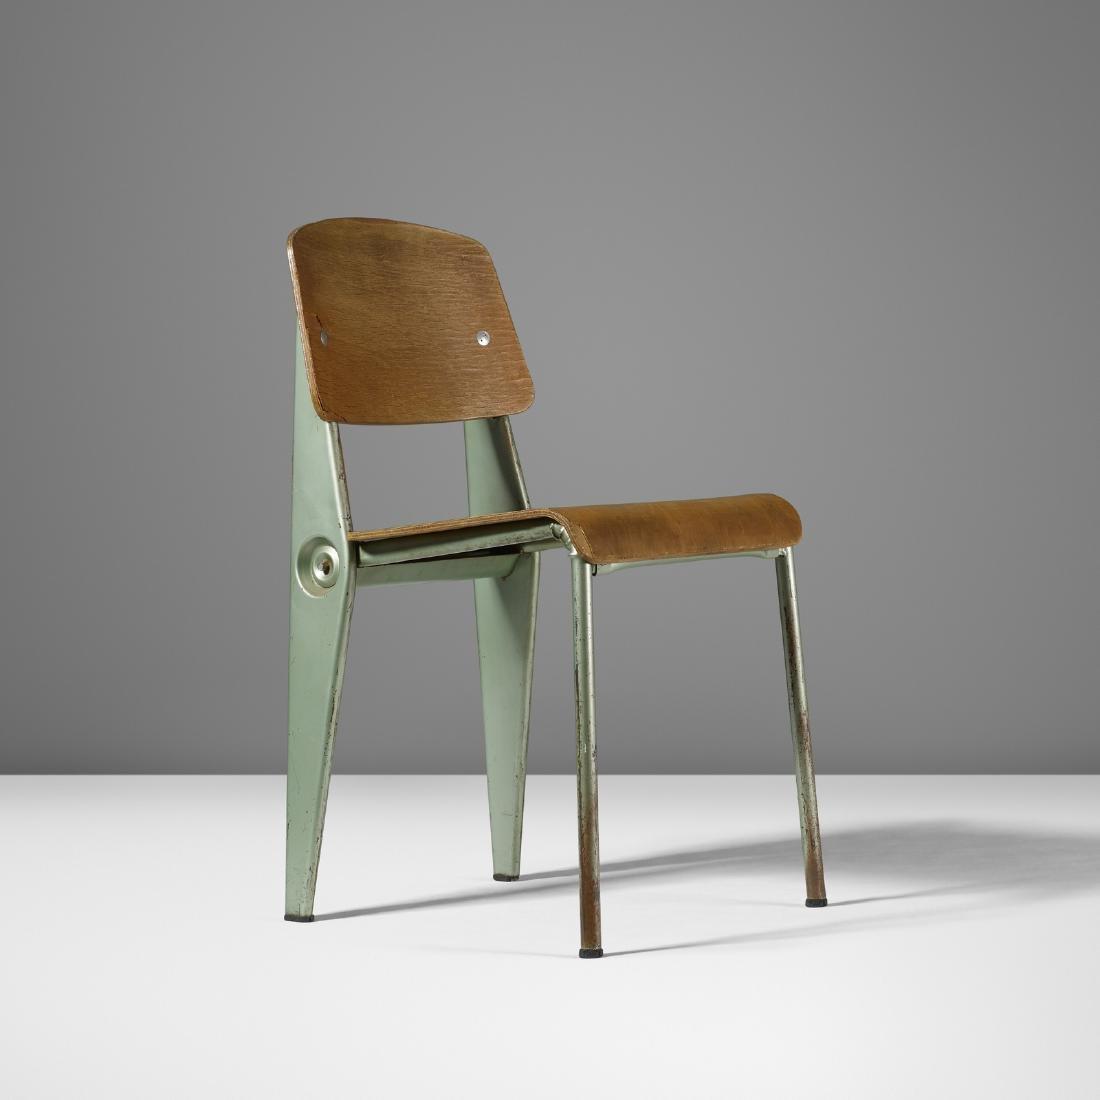 Jean  Prouve, Demountable chair, no. 300